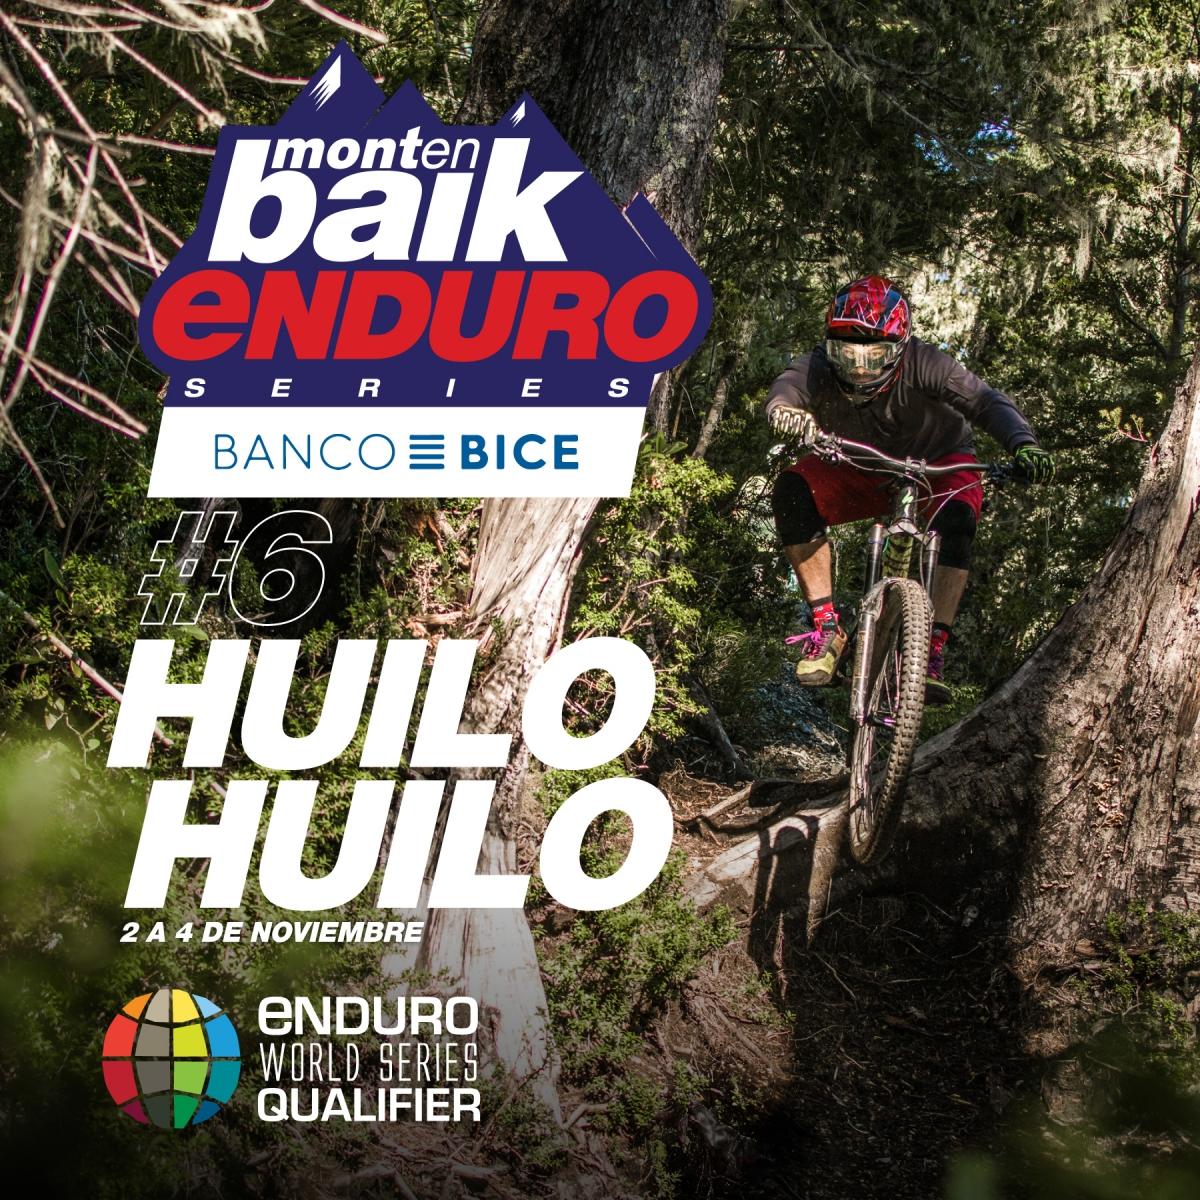 Huilo Huilo #6 Montenbaik Enduro Series 2018